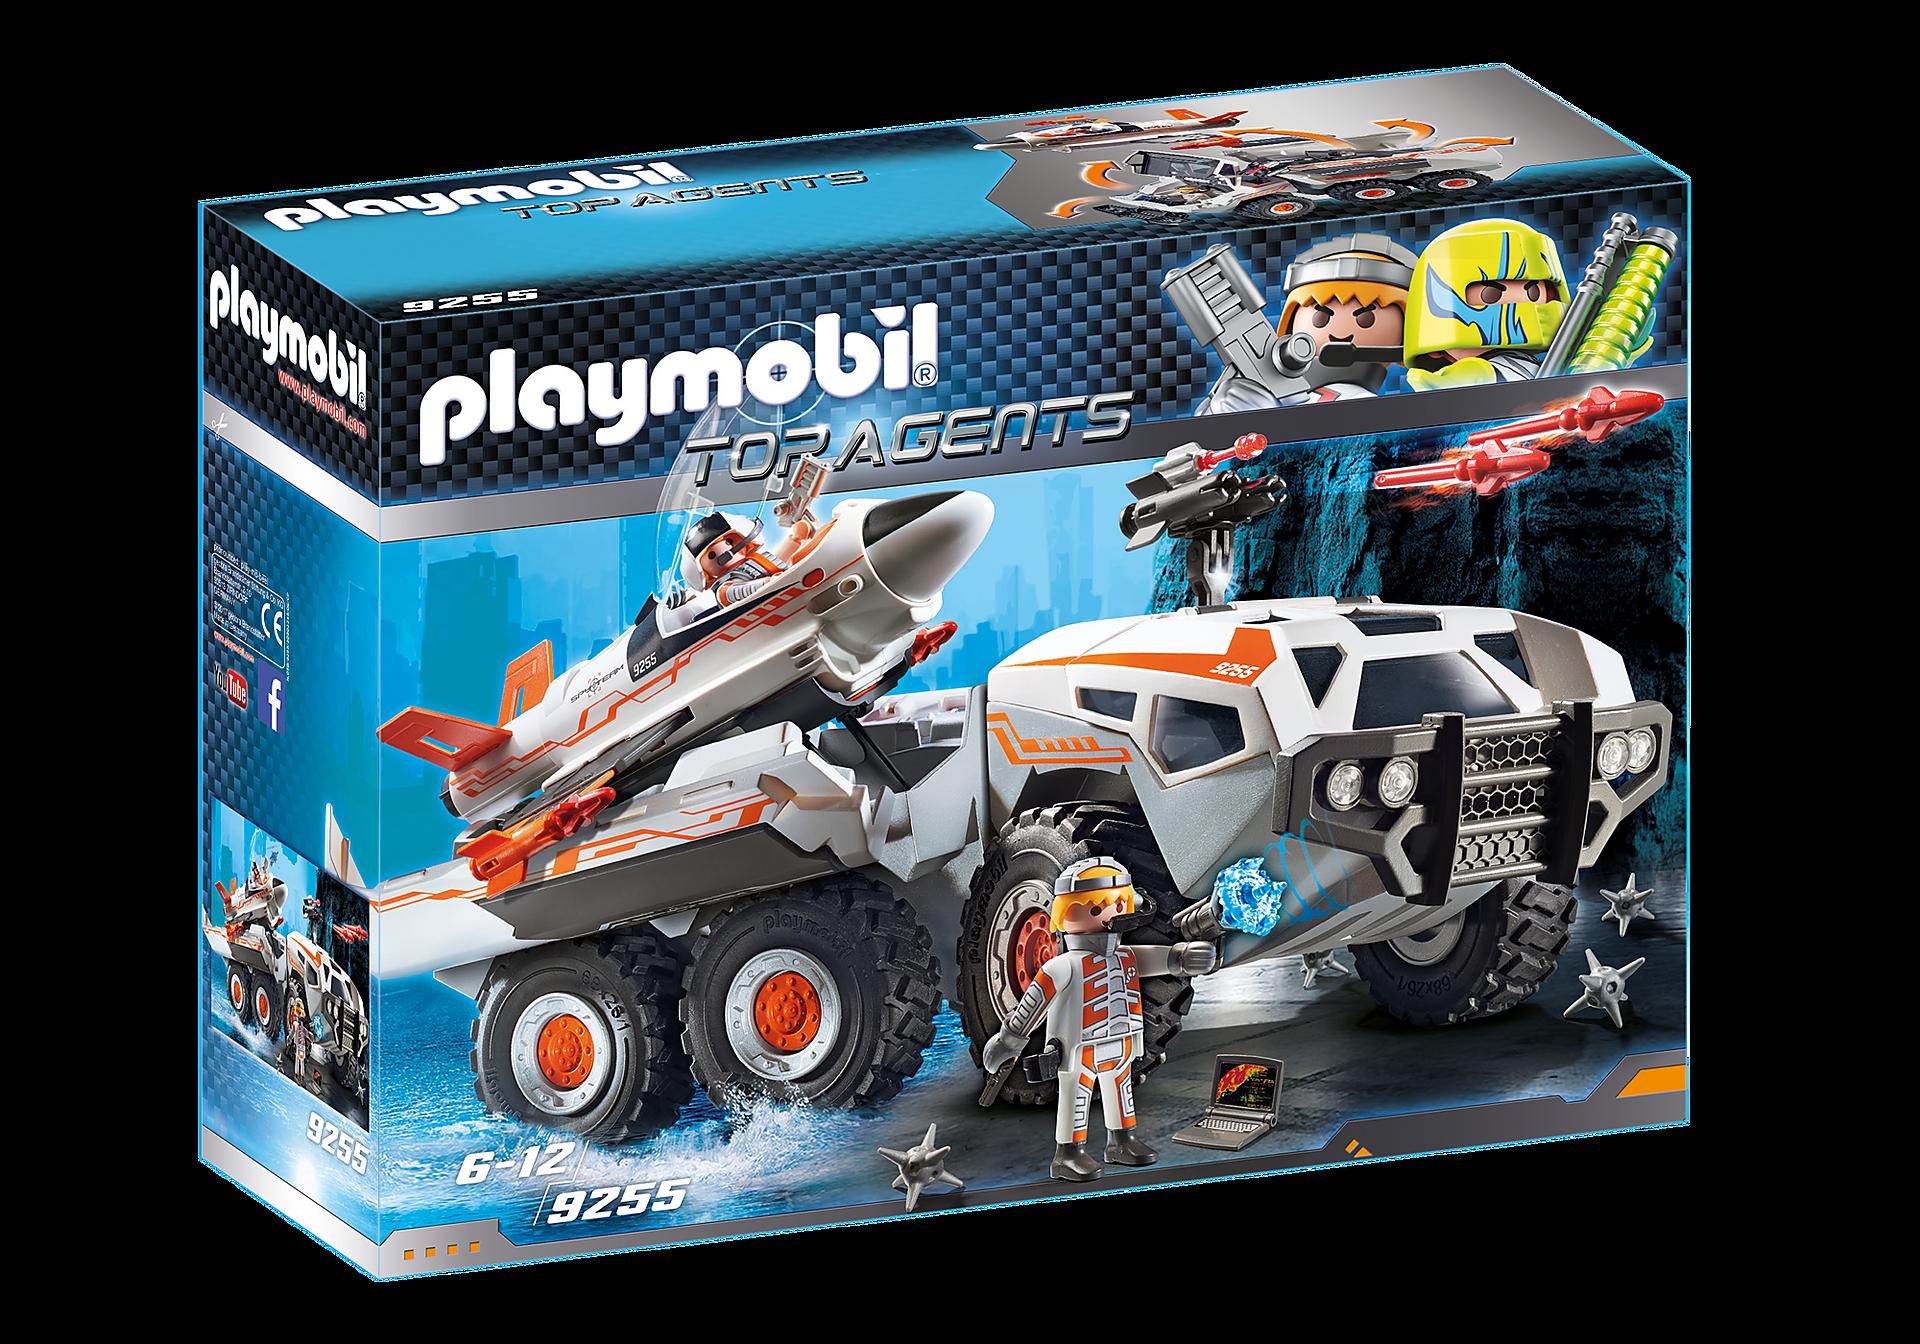 http://media.playmobil.com/i/playmobil/9255_product_box_front/SpyTeam Battle Truck